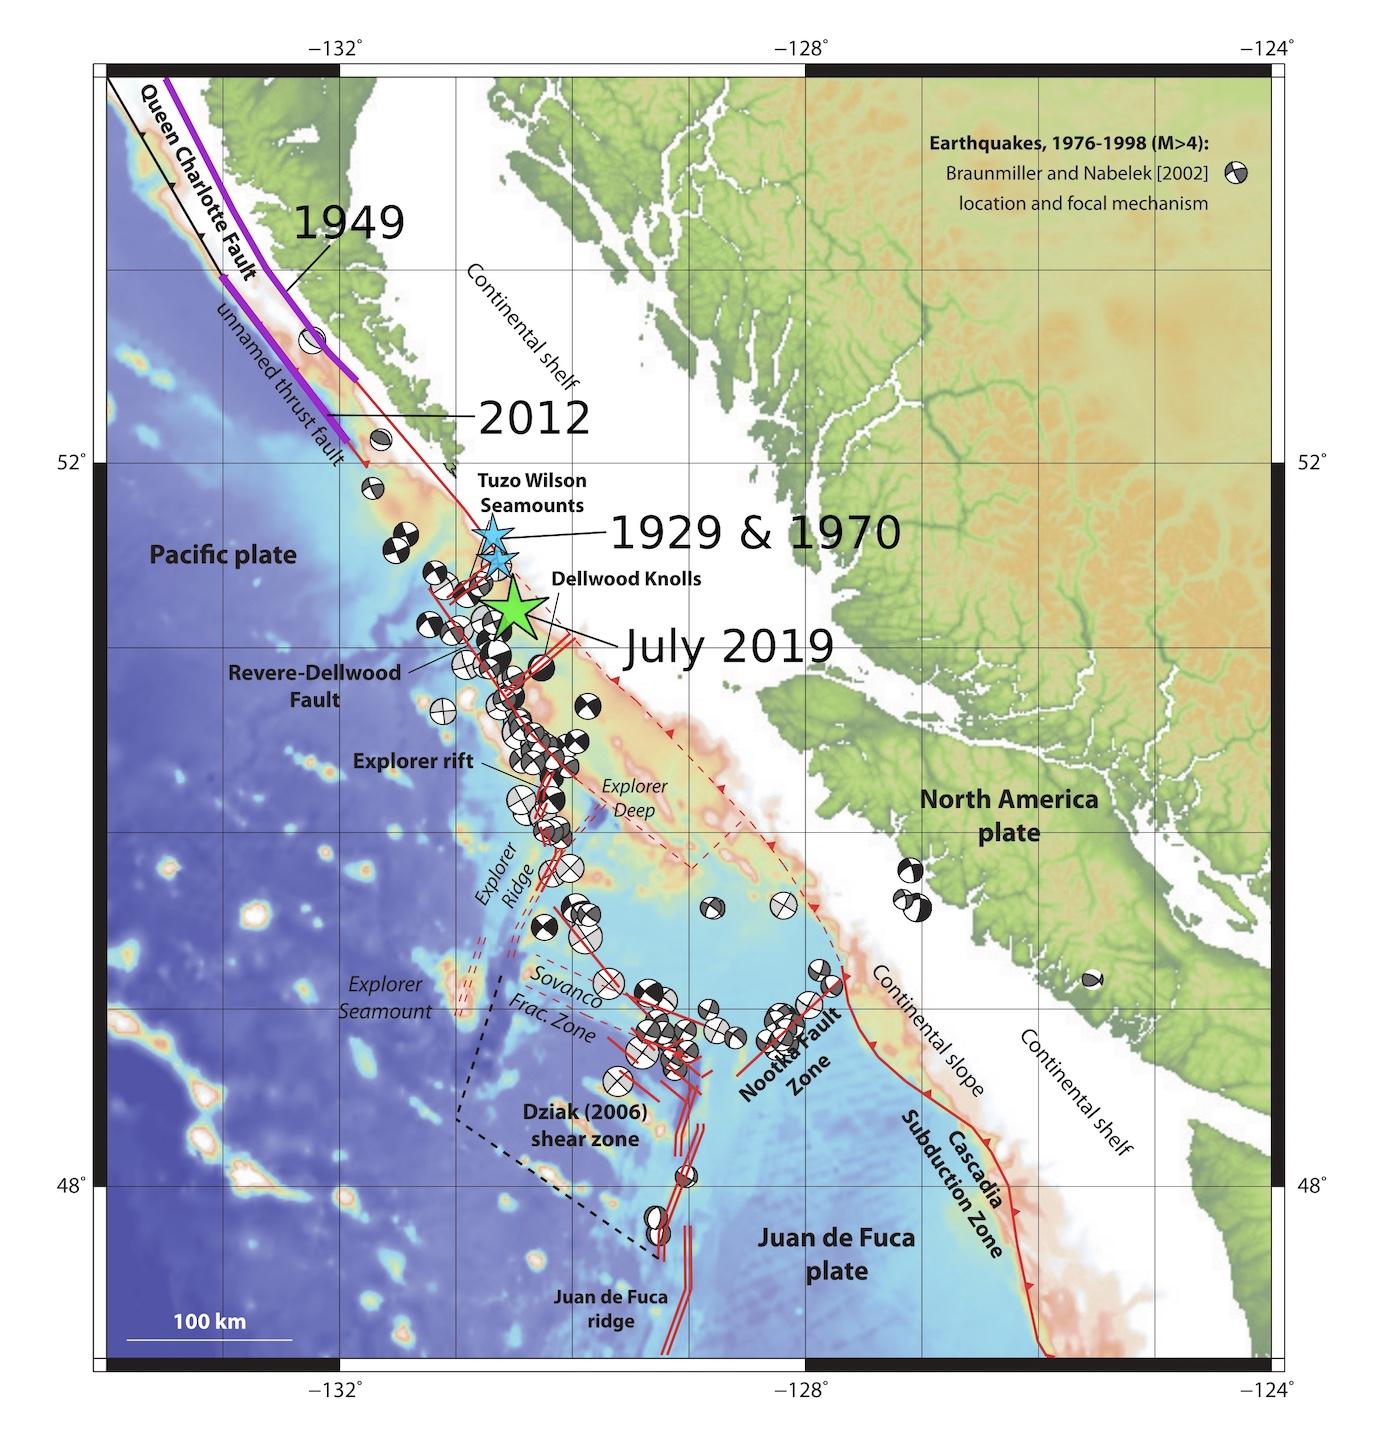 Western Canada Earthquake Map Earthquake Just North of Cascadia is Felt Along Canada's West